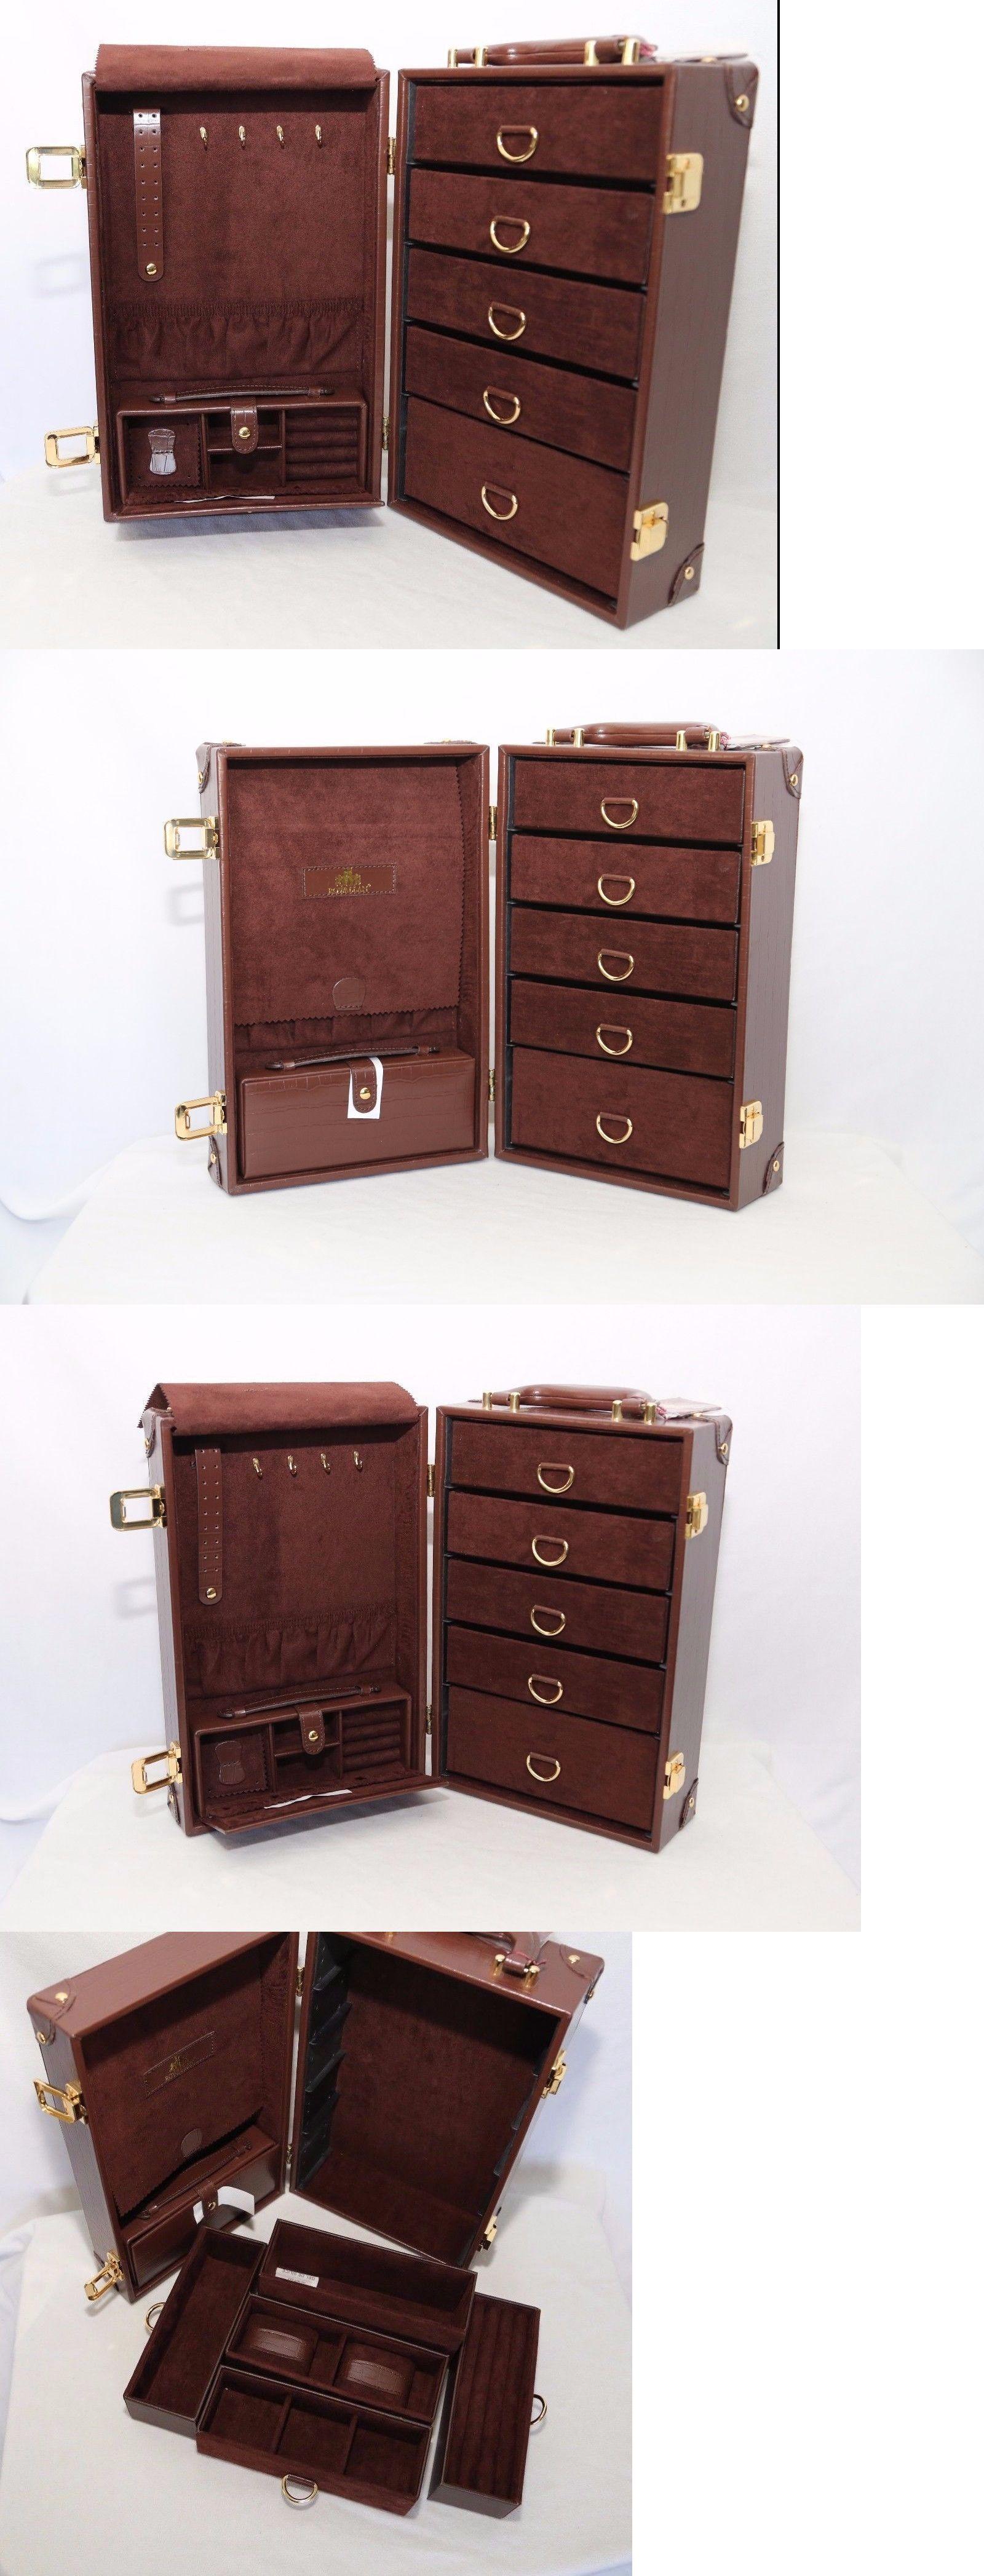 Jewelry Boxes 3820 Rowallan Of Scotland Brown Genuine Bonded